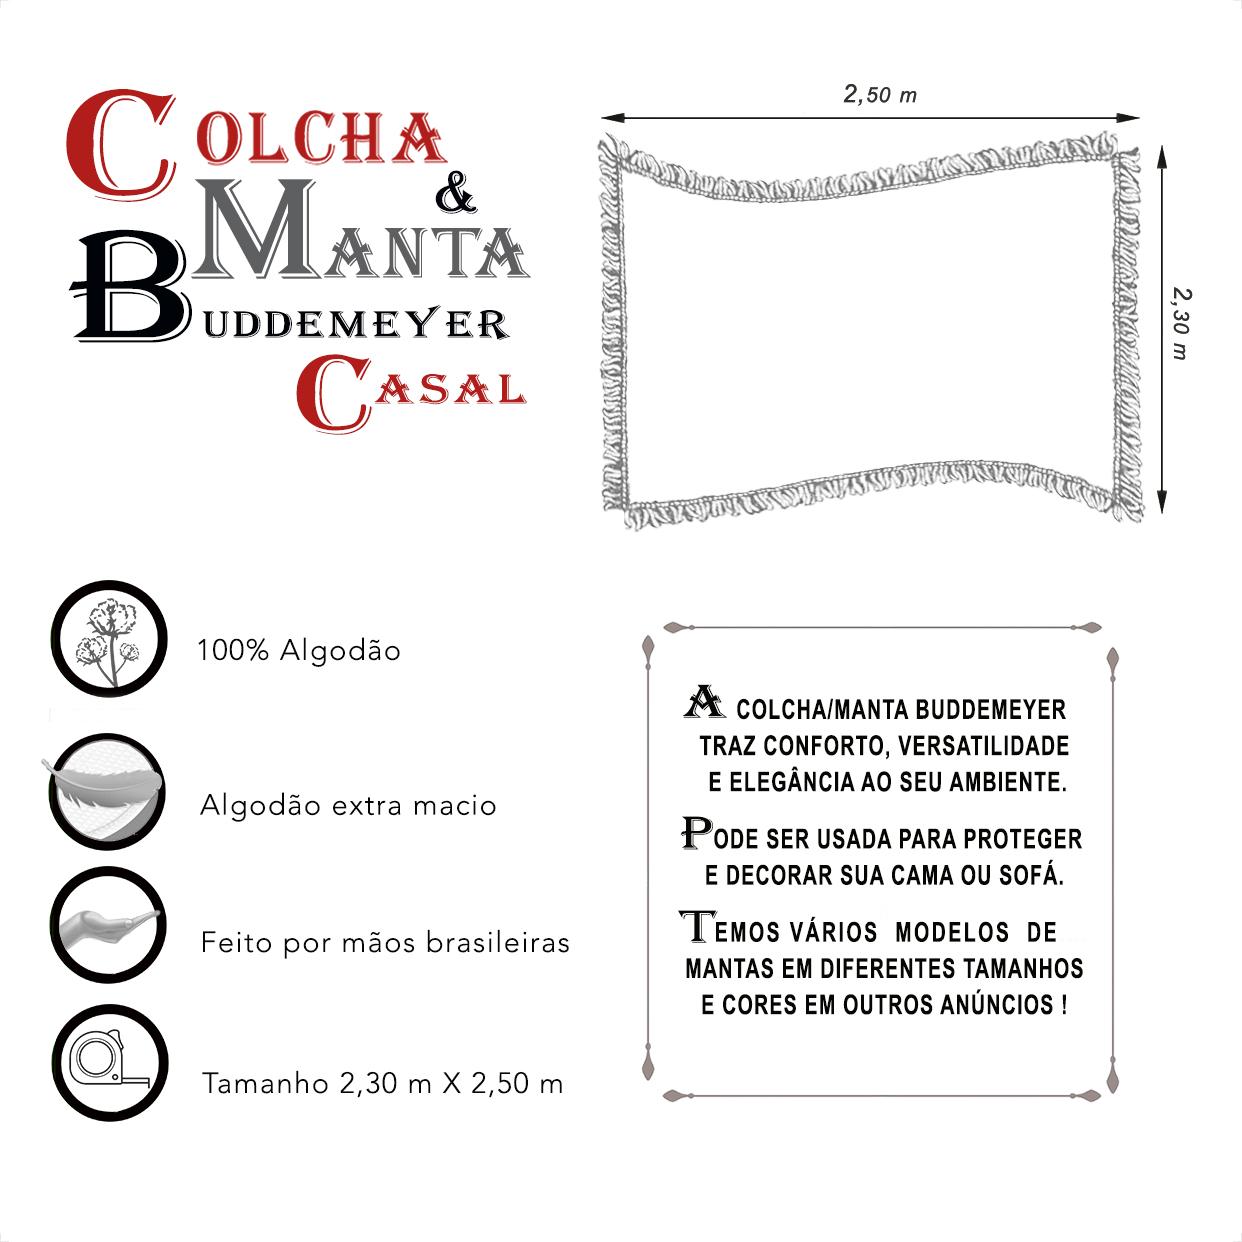 Manta e Colcha Buddemeyer Casal Grafite 2,30m x 2,50m